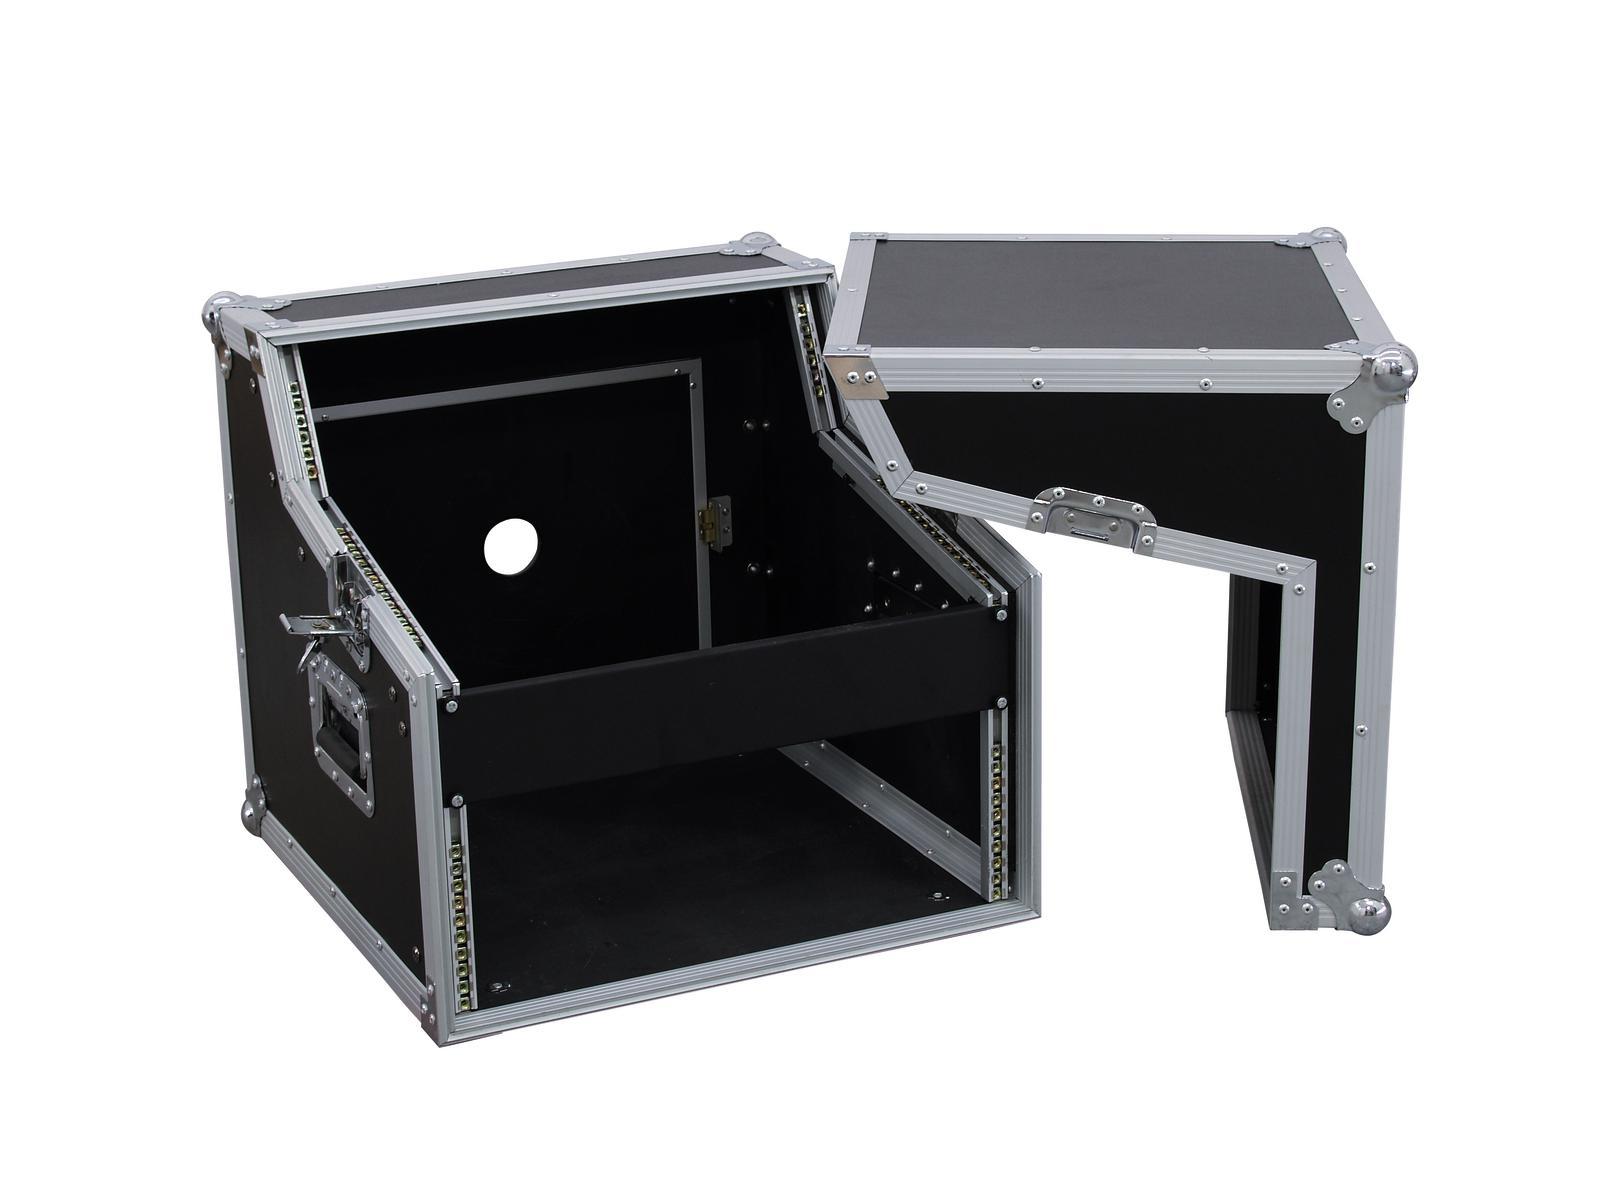 ROADINGER Speciale mixer/CD player caso 3/7/6U